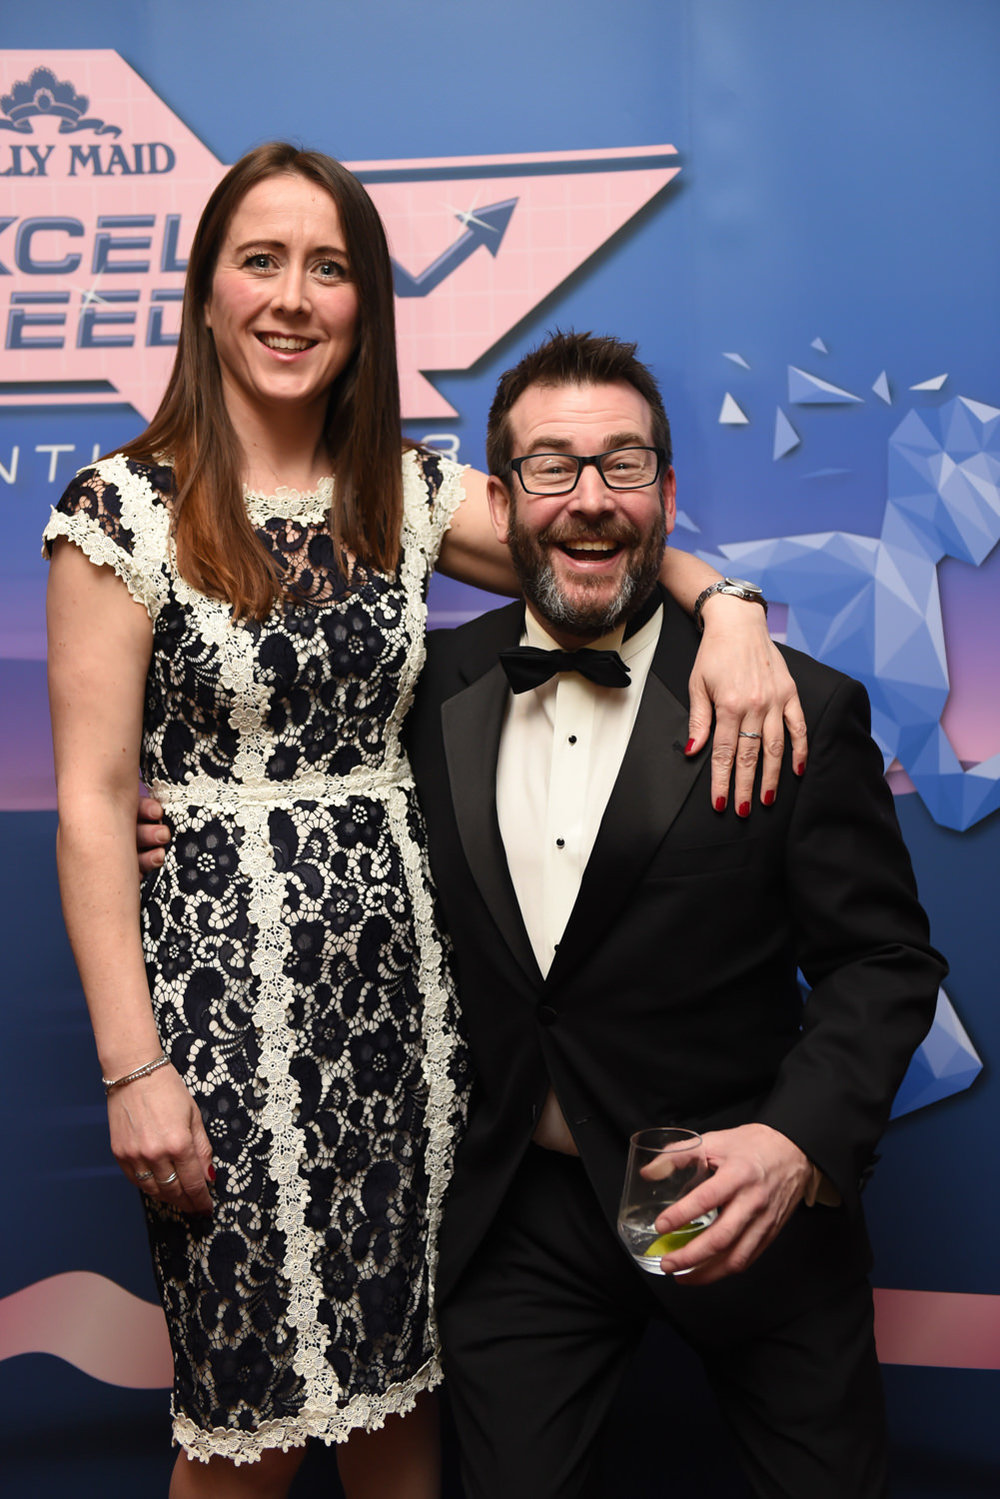 MollyMaid_Awards_46.jpg